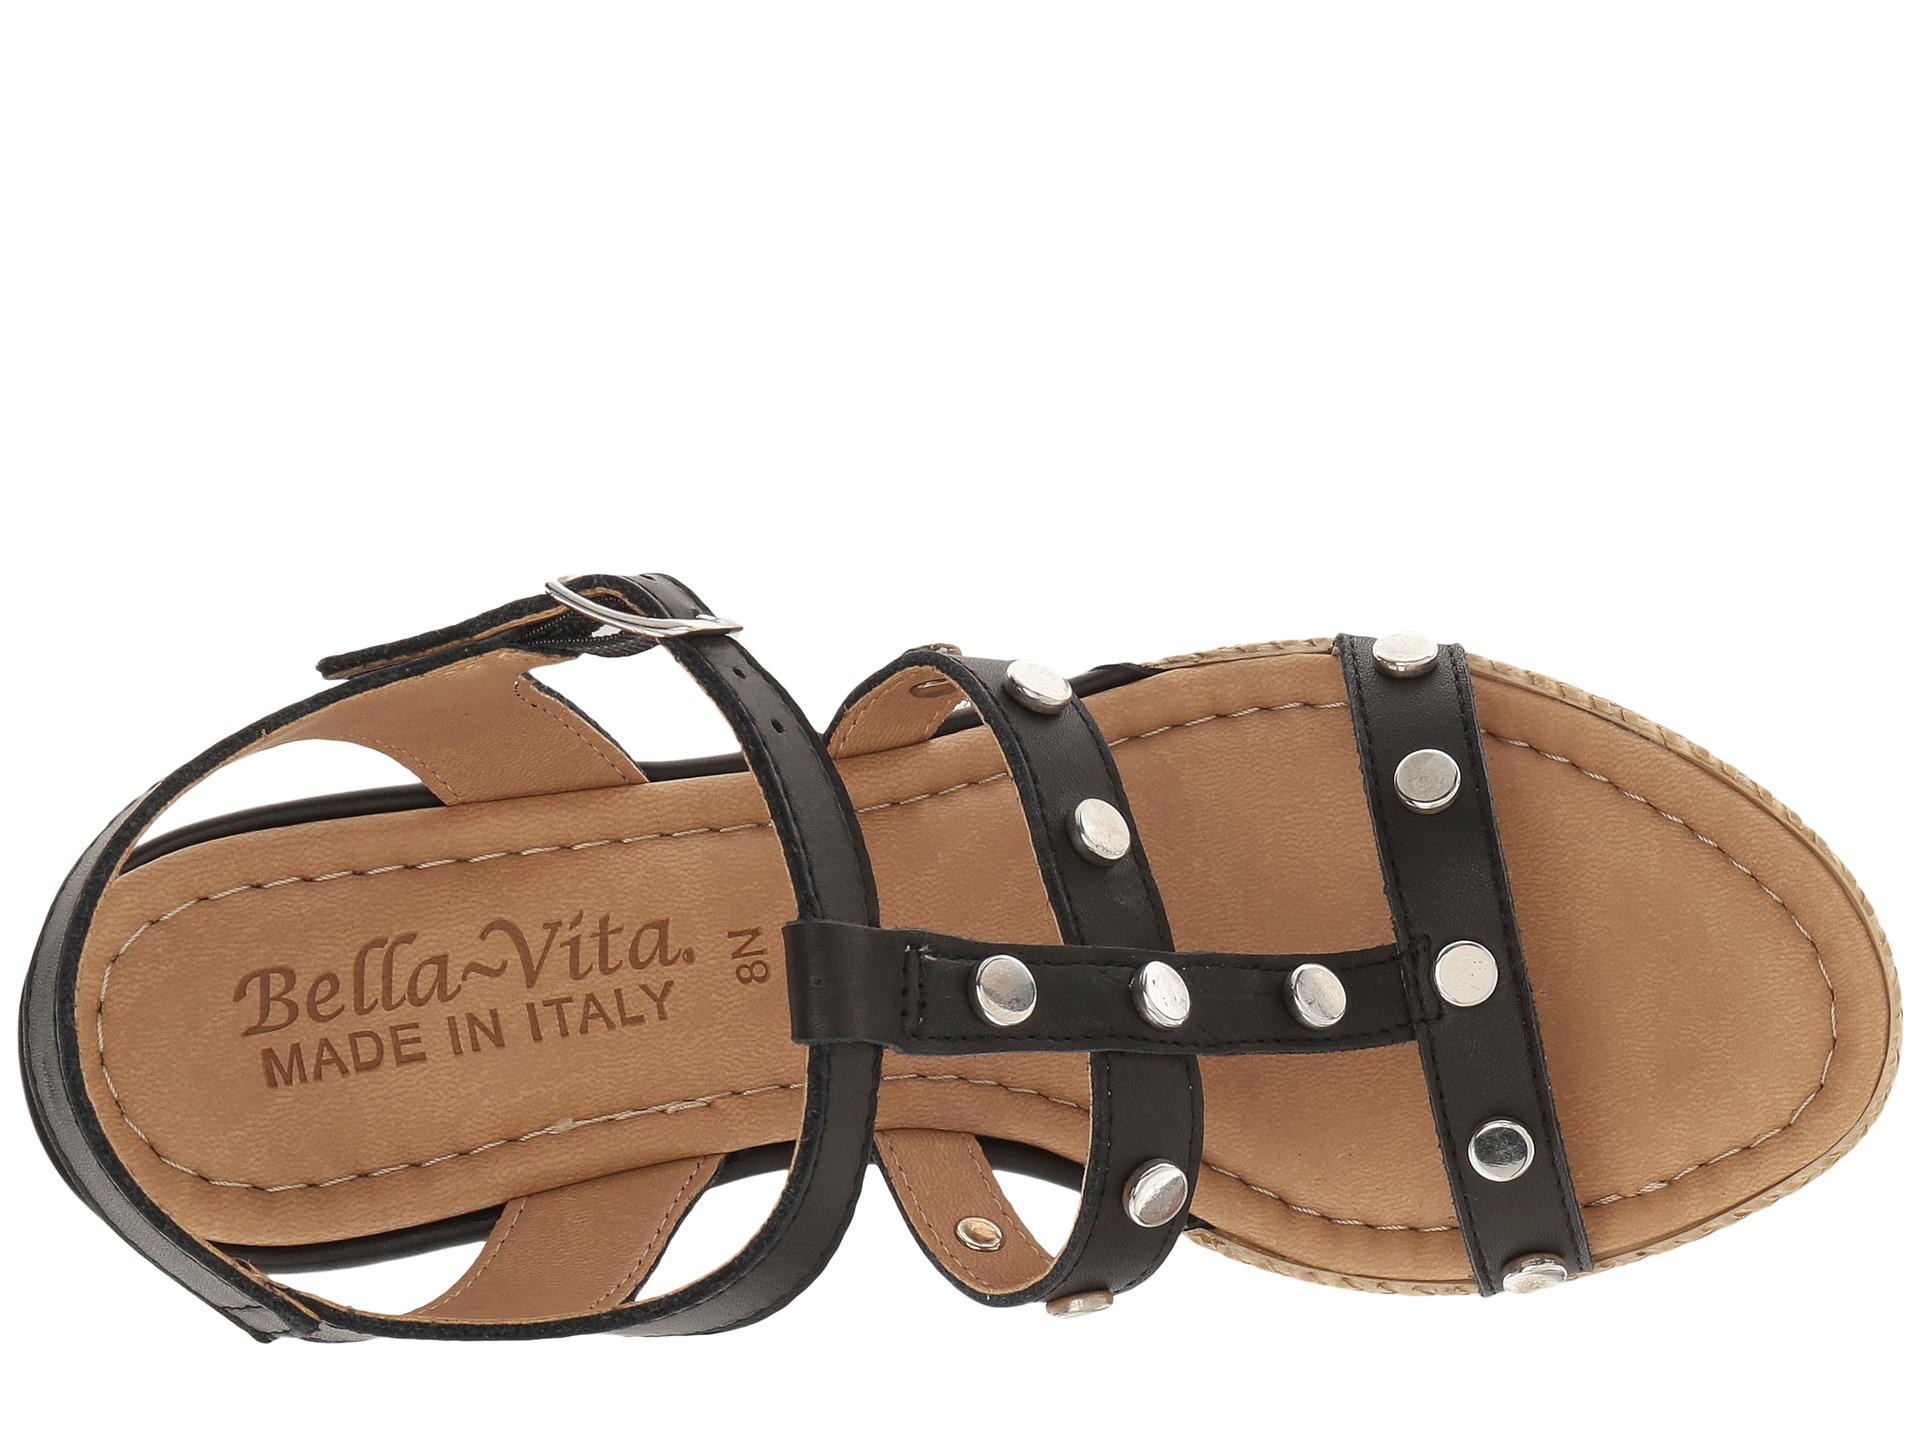 Bella Vita Shoes Reviews